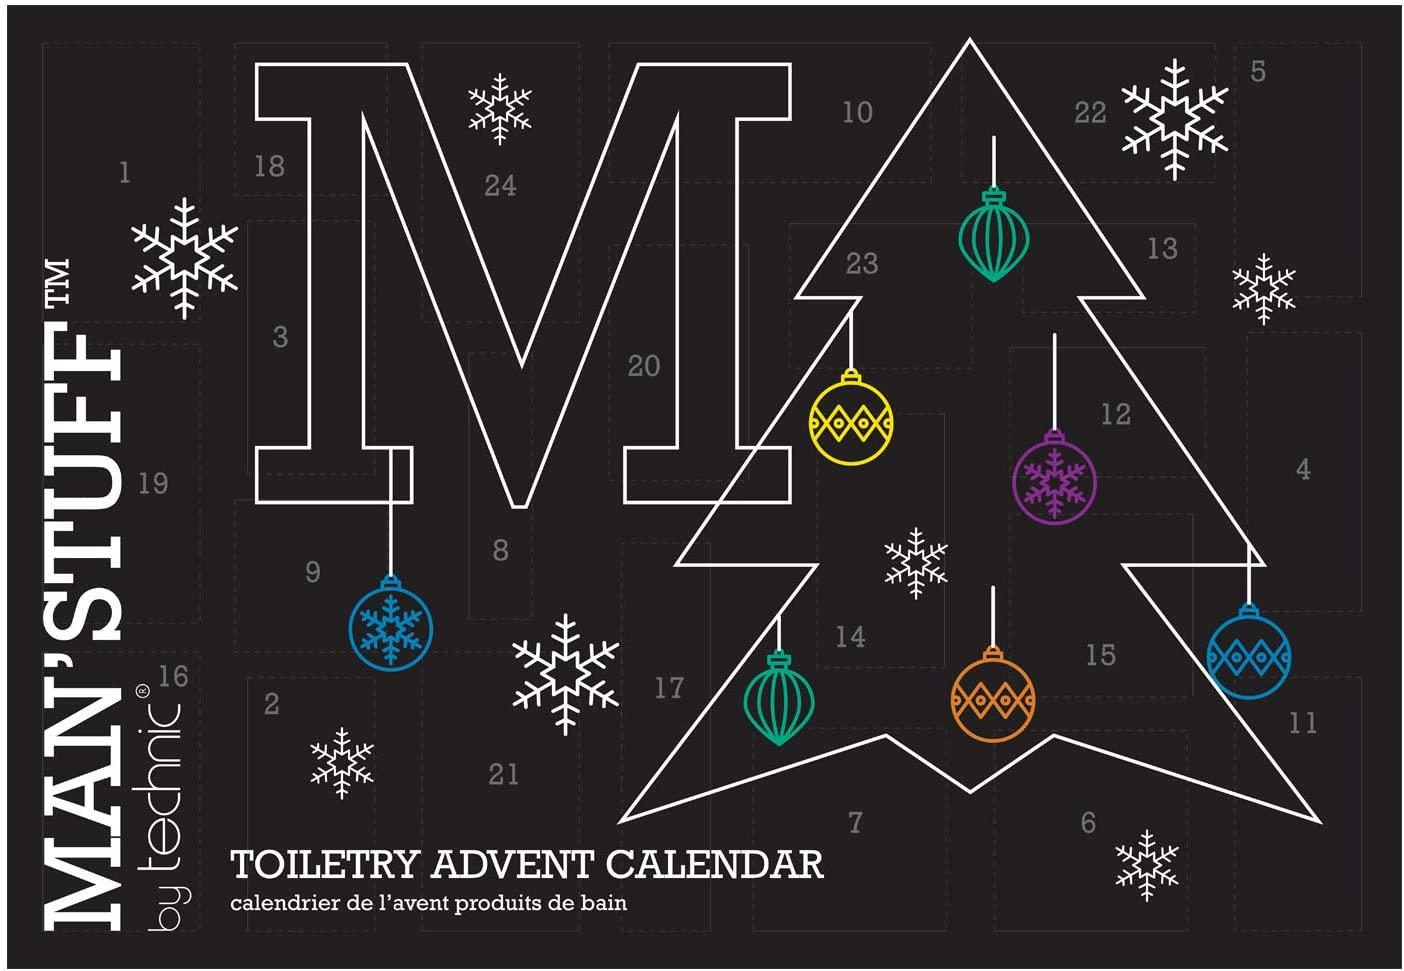 Man'Stuff Toiletry Advent Calendar